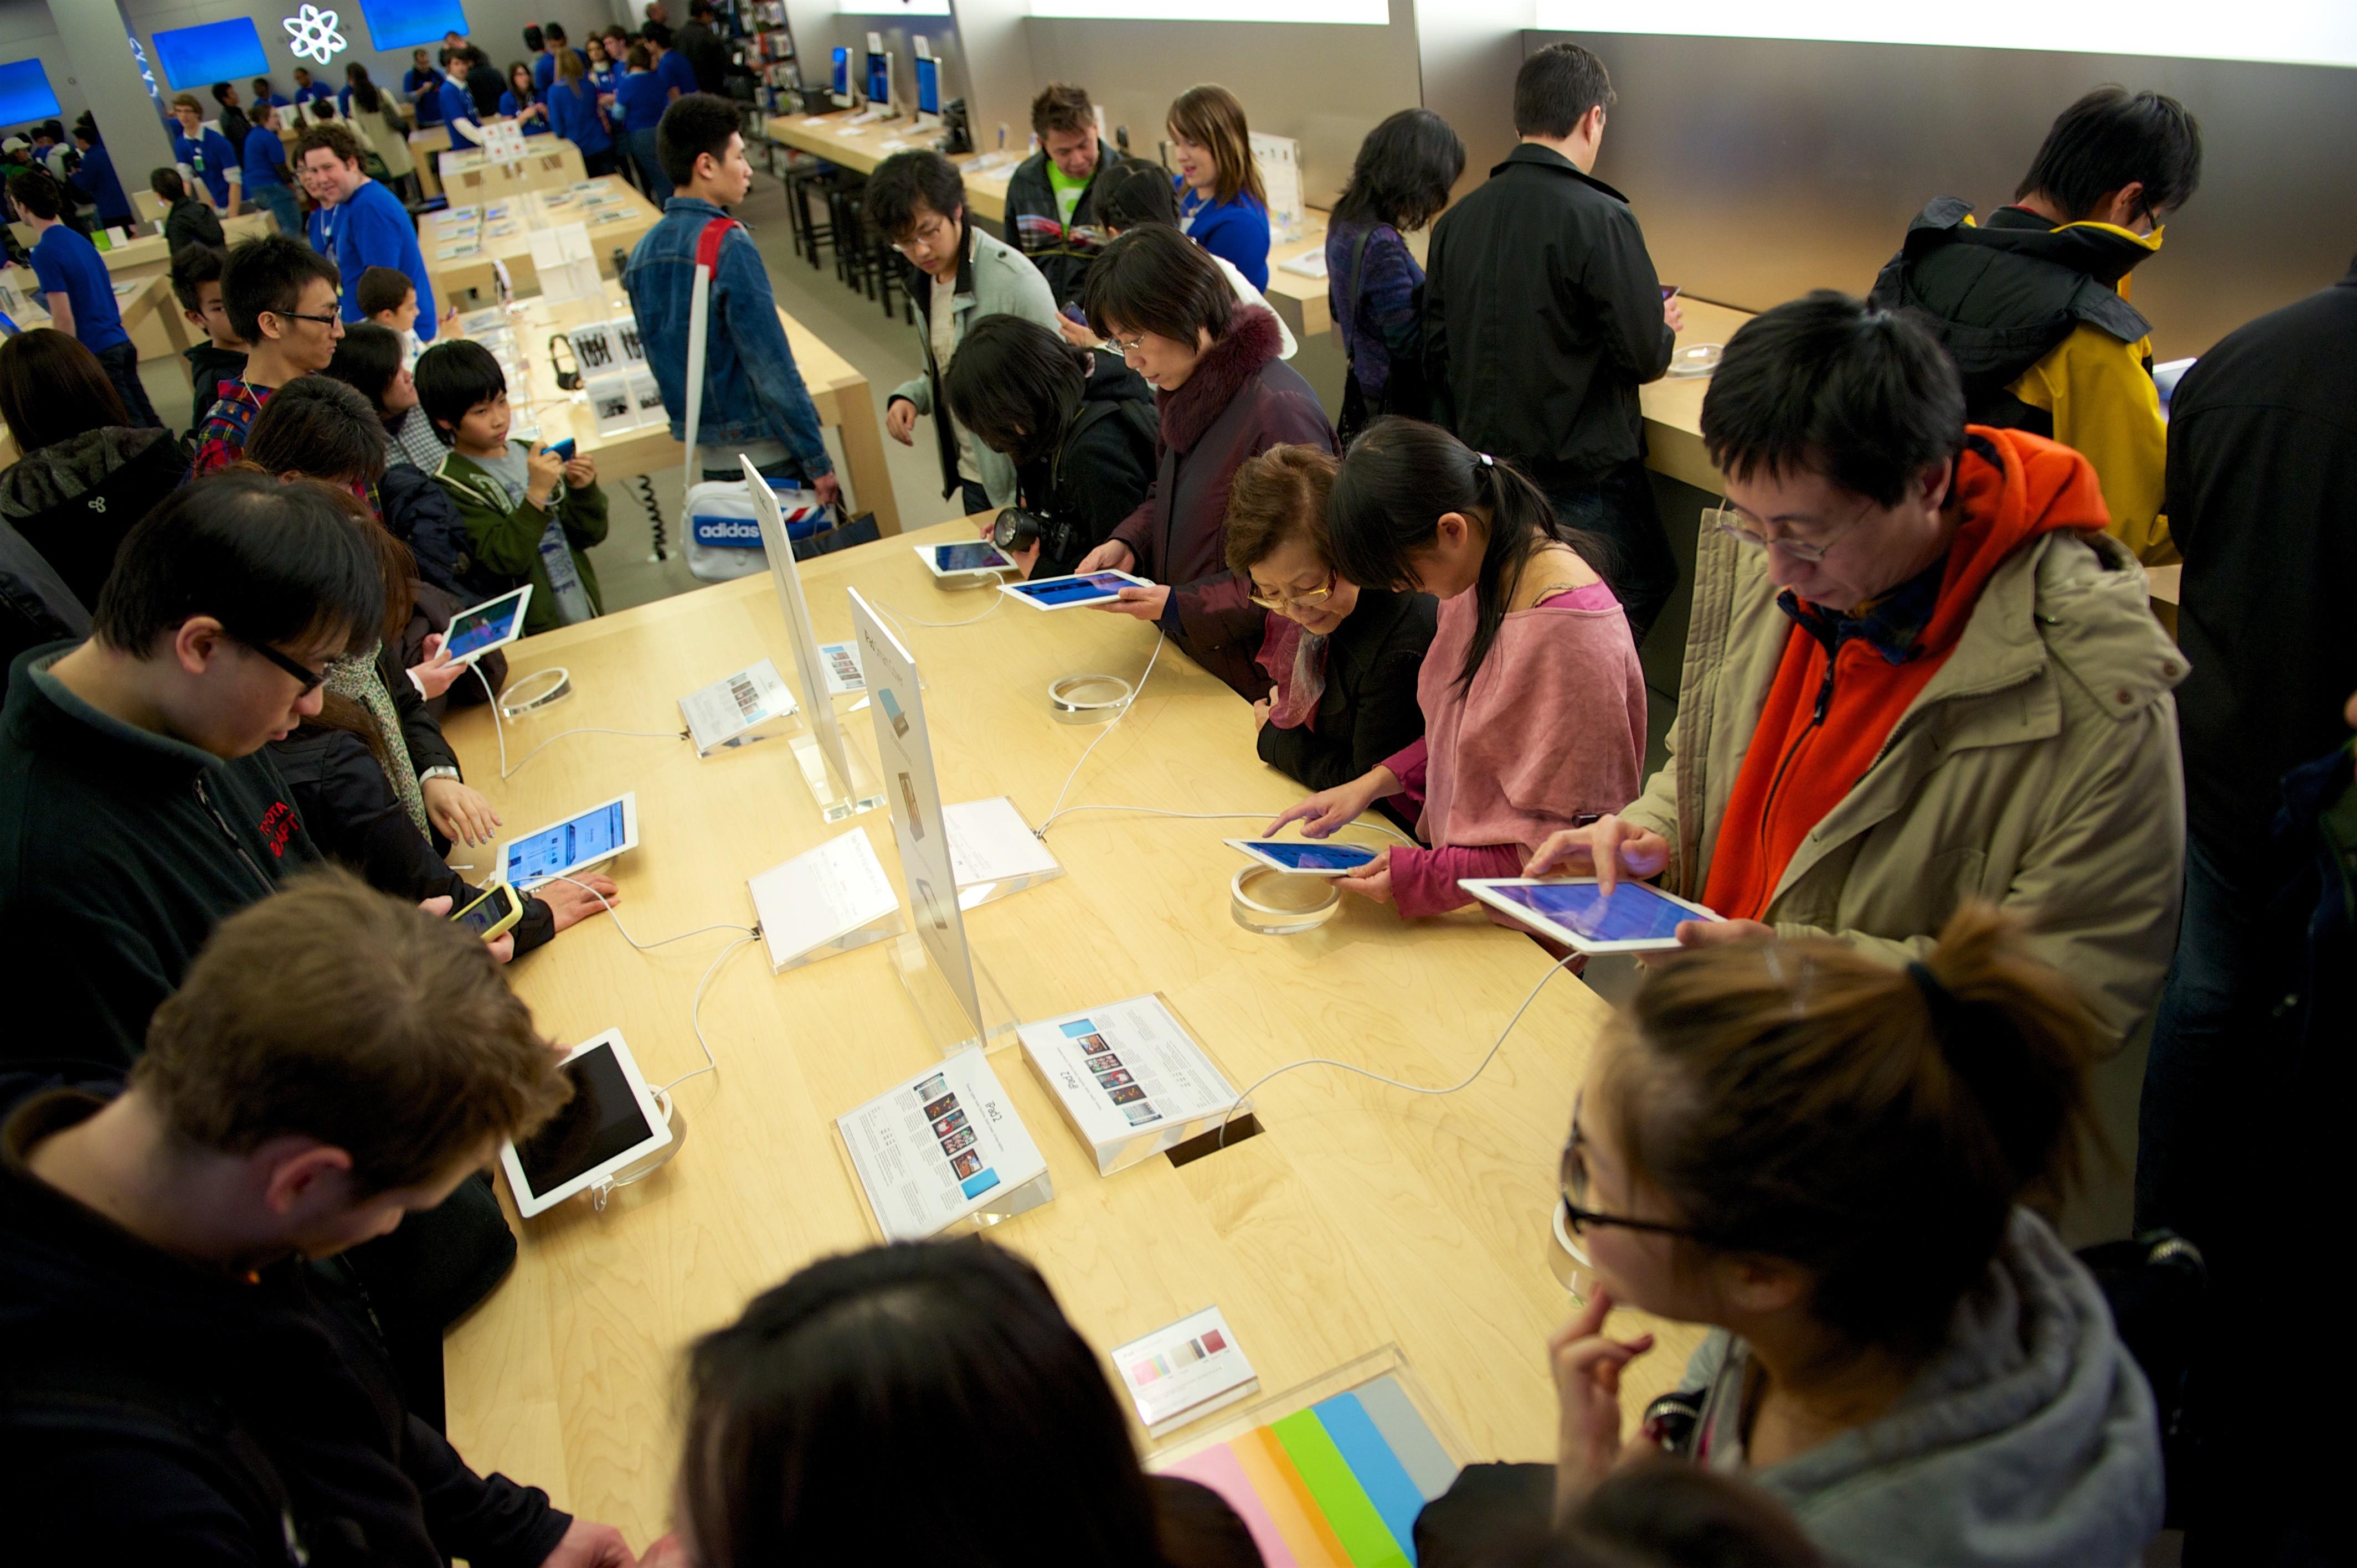 Apple Store 的展示桌總是聚集了試玩的人潮(照片片提供:Michael)